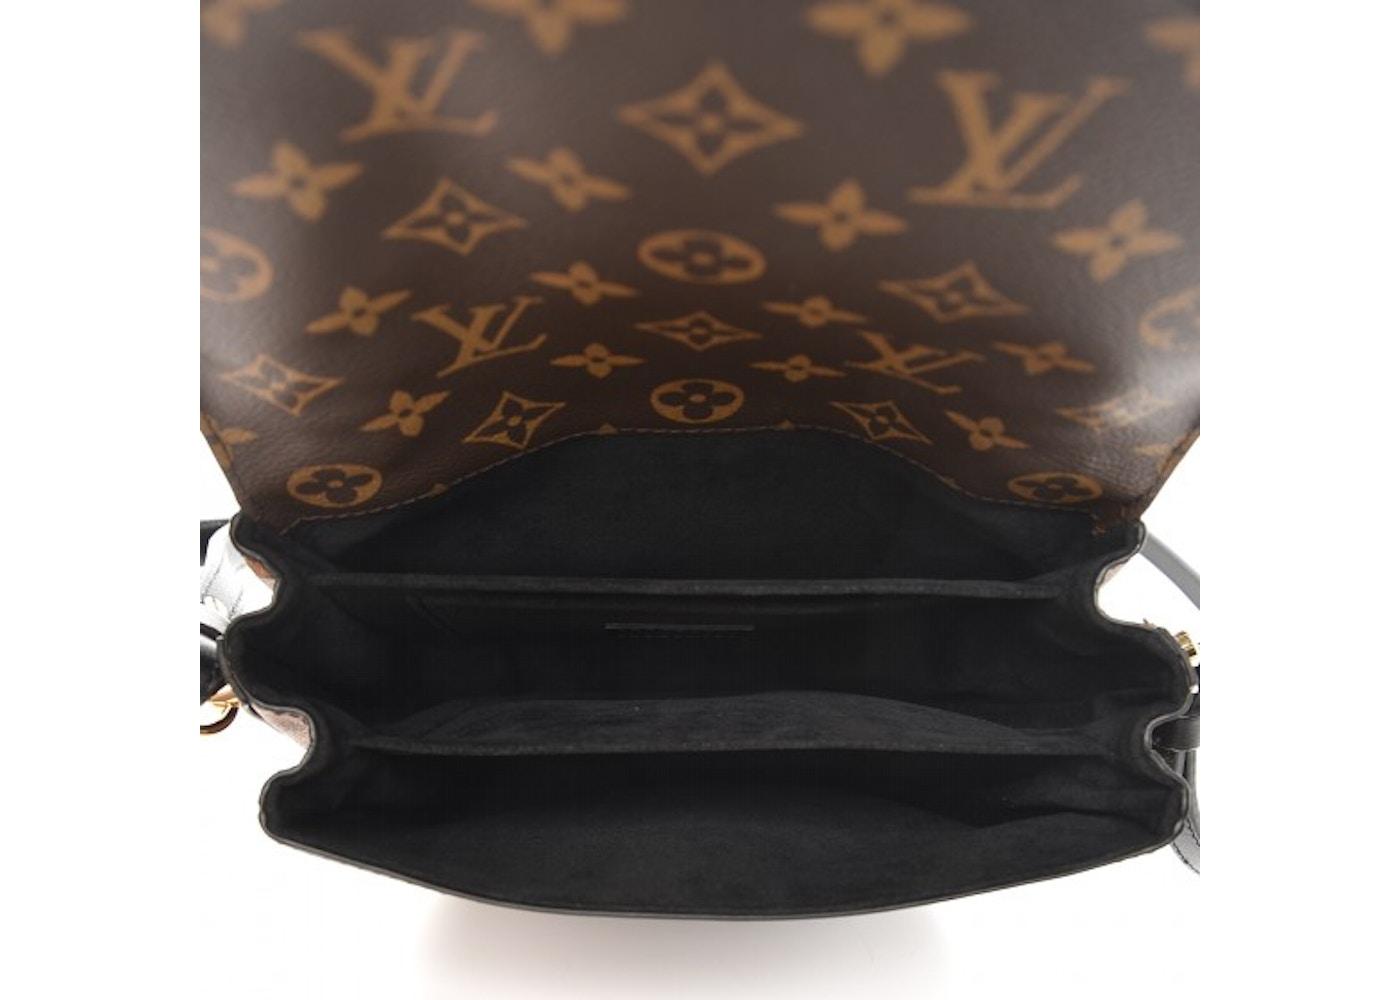 e35f7fa76f99 Louis Vuitton Crossbody Chantilly Lock Monogram Reverse Noir Black